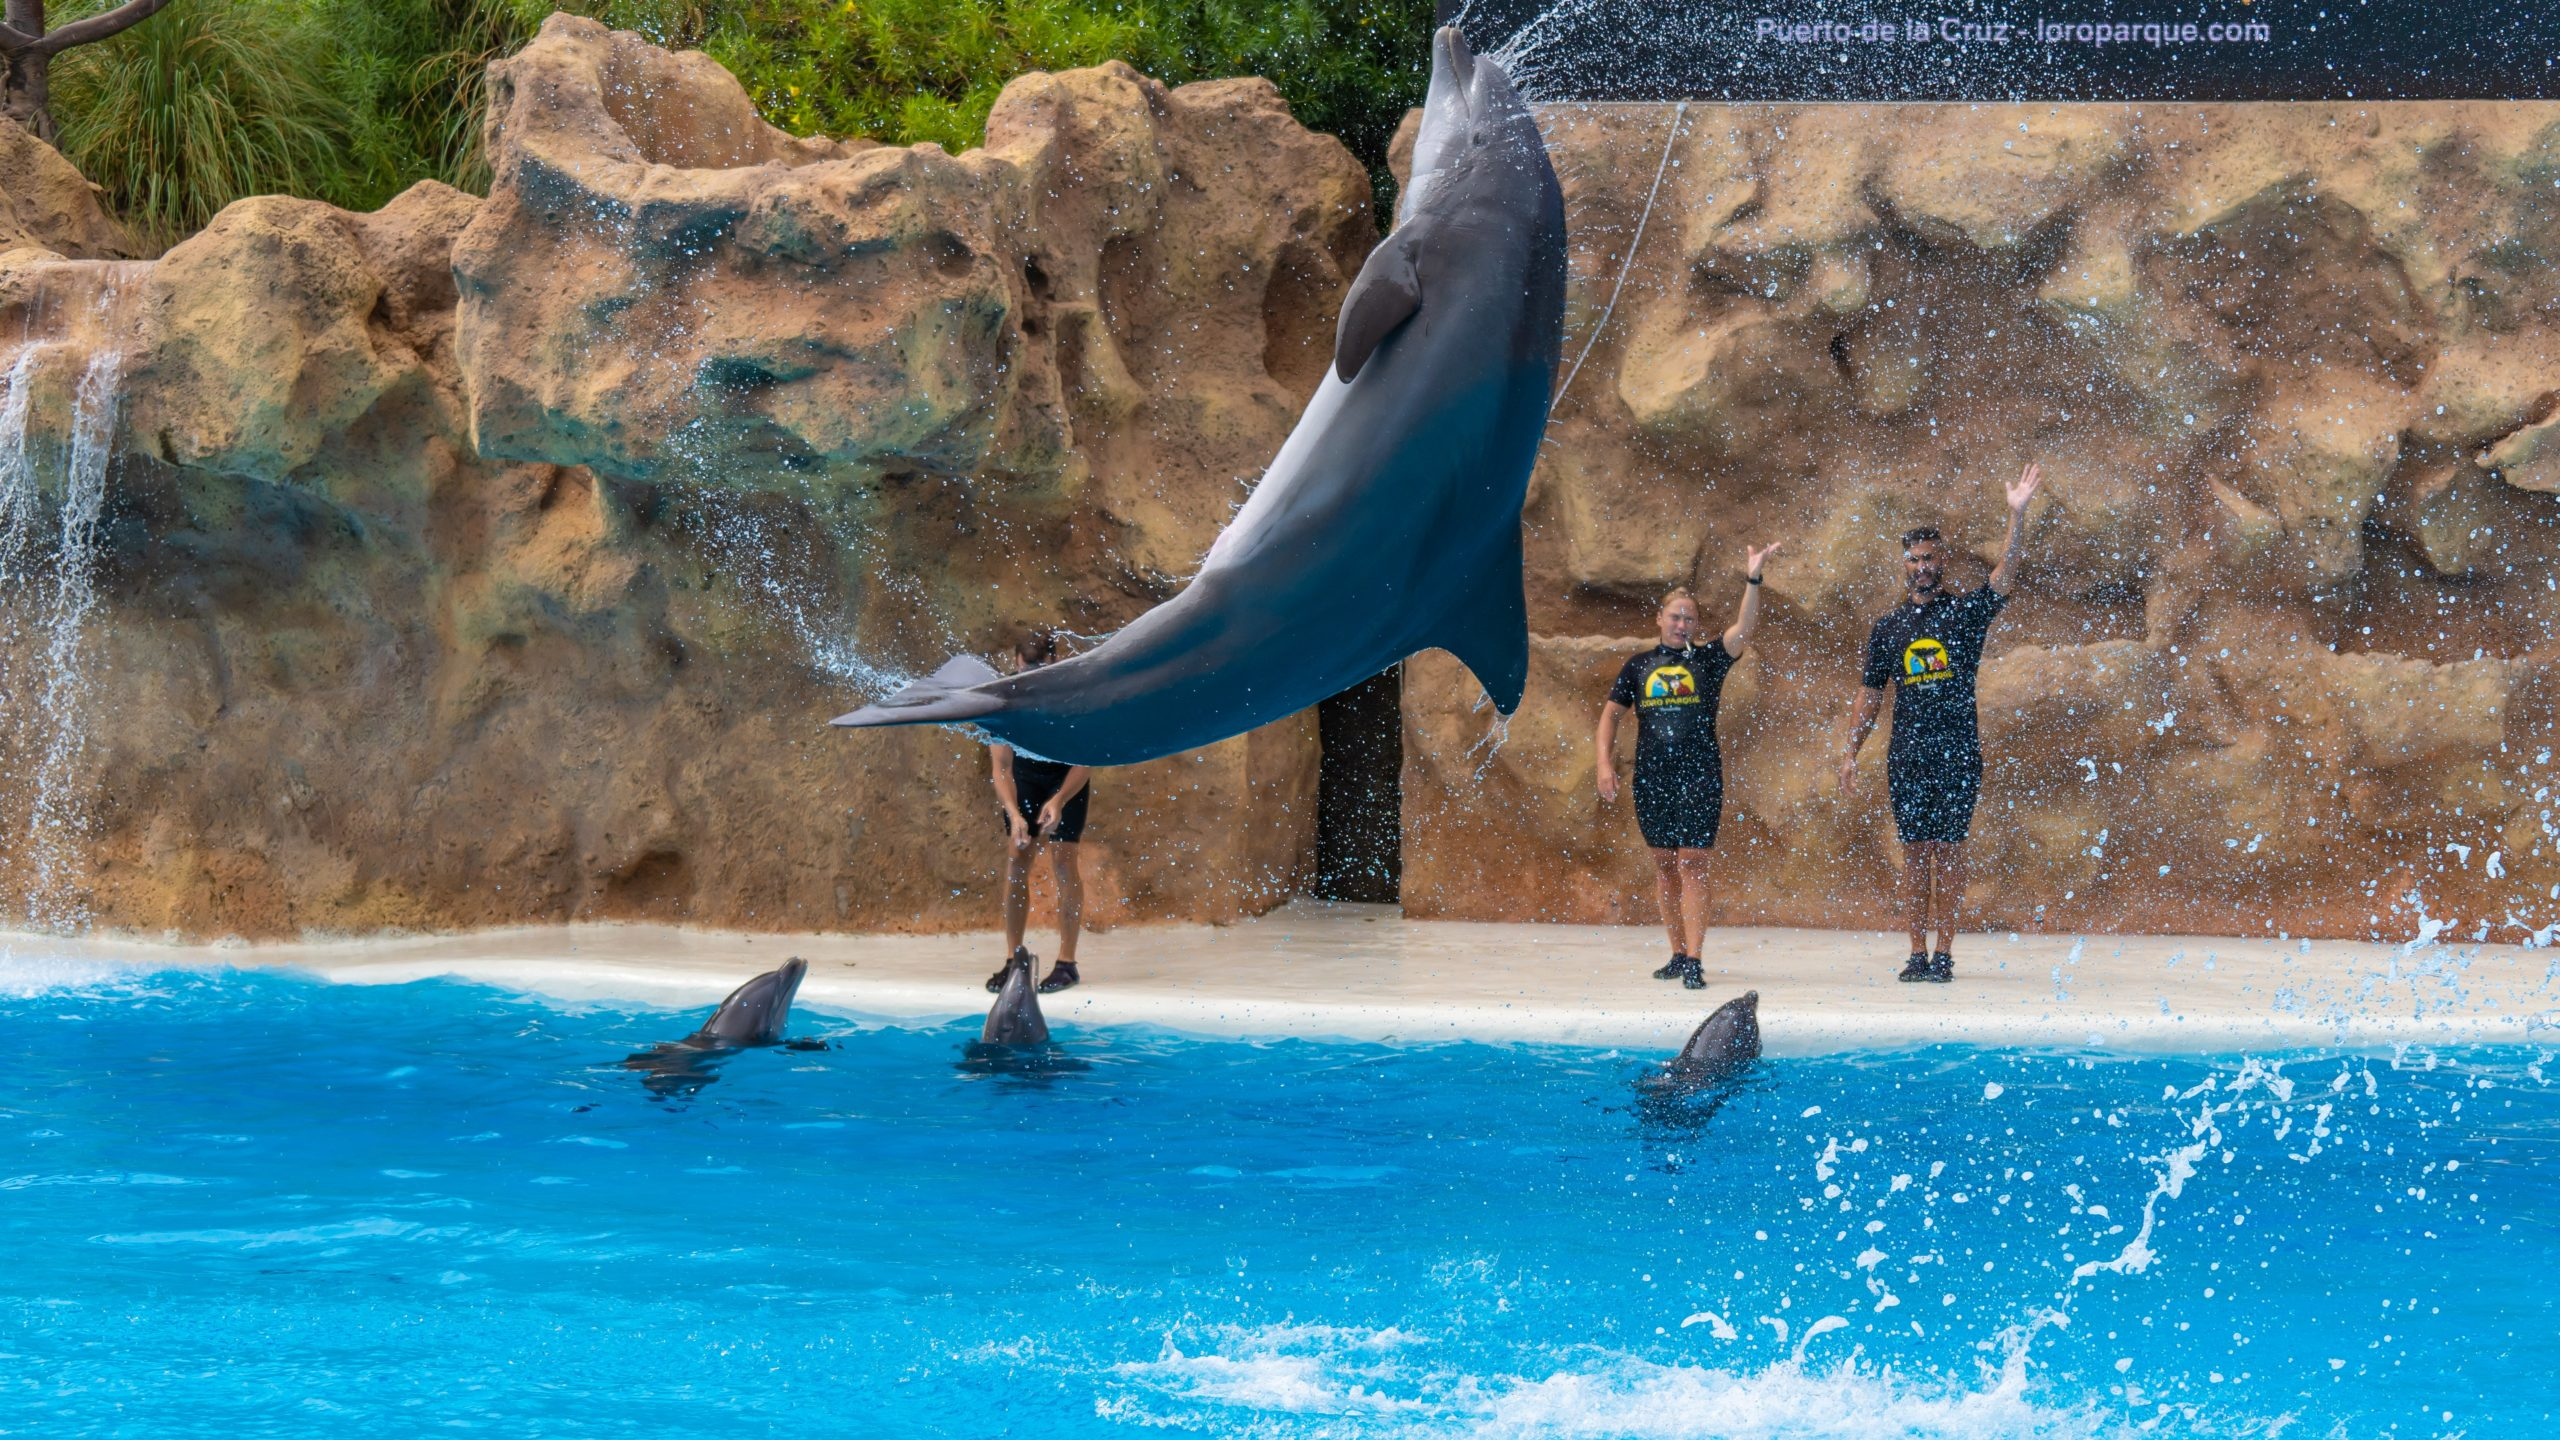 Atlantik, Teneriffa, La Orotava, im Loro Parque, Delfine